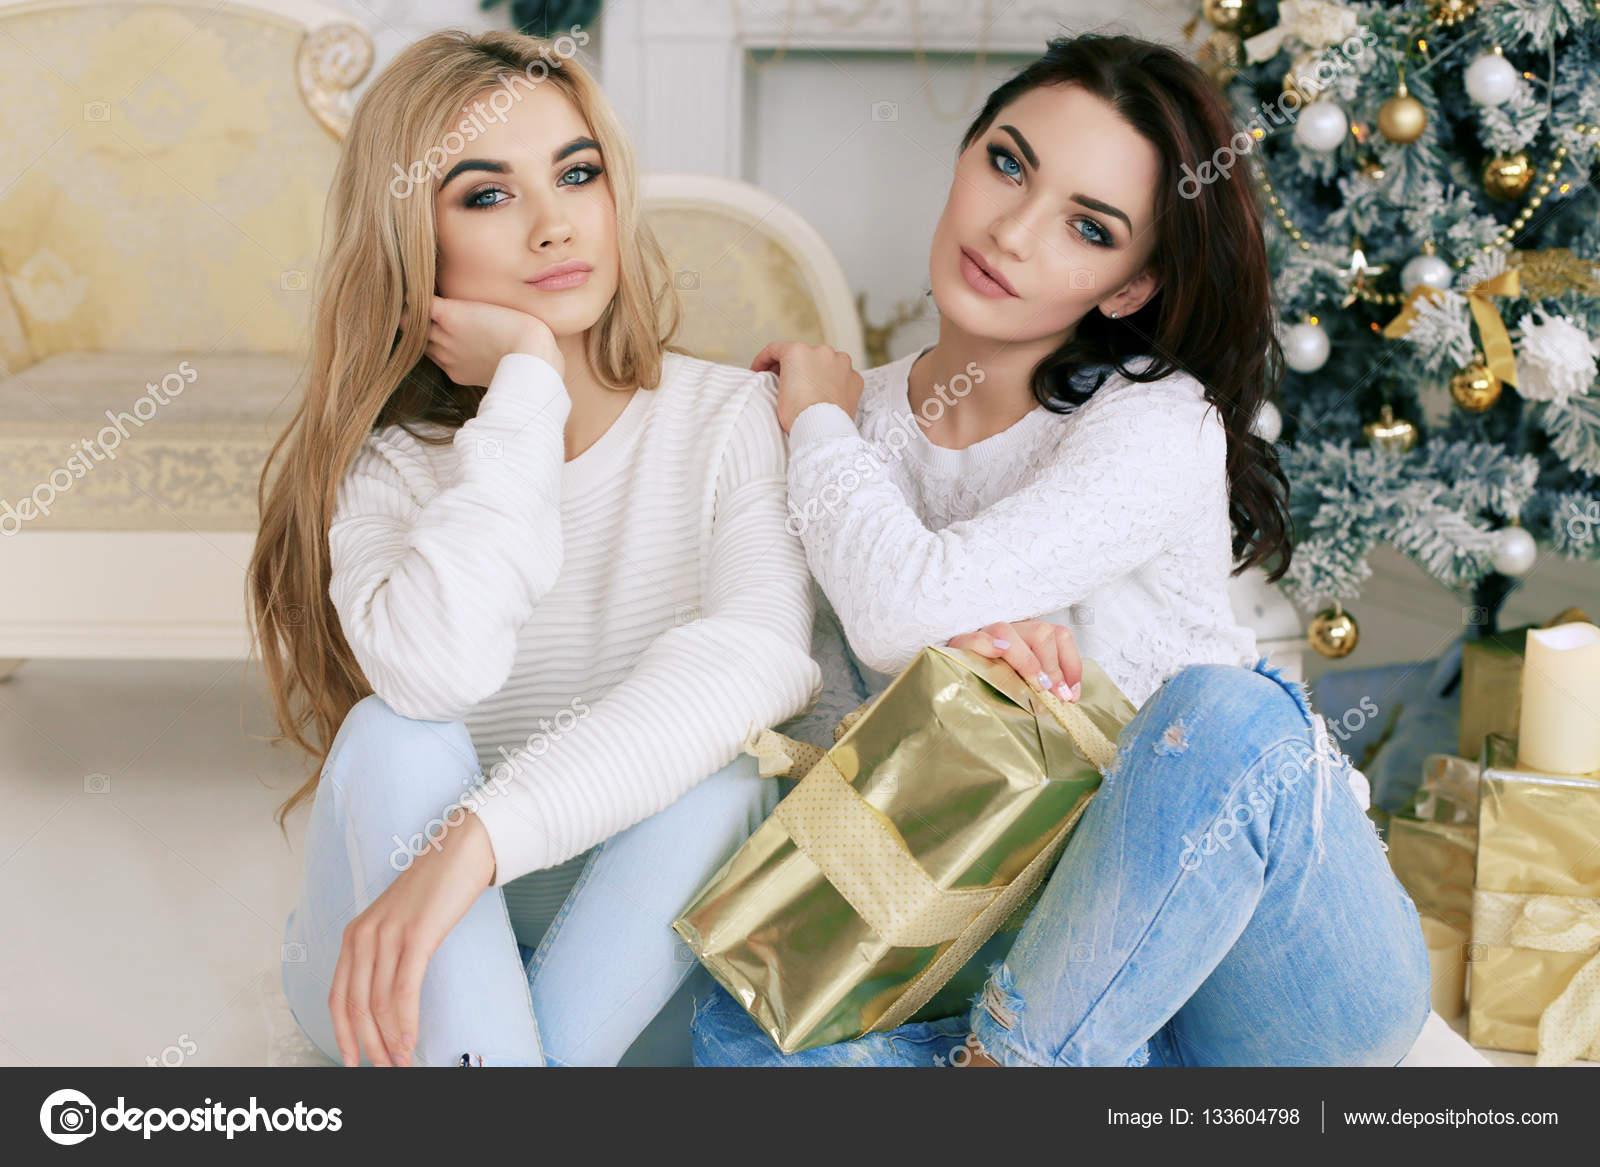 18edca546ca Όμορφα κορίτσια στο άνετο σπίτι ρούχα γιορτάζουν το νέο έτος διακοπές —  Φωτογραφία Αρχείου